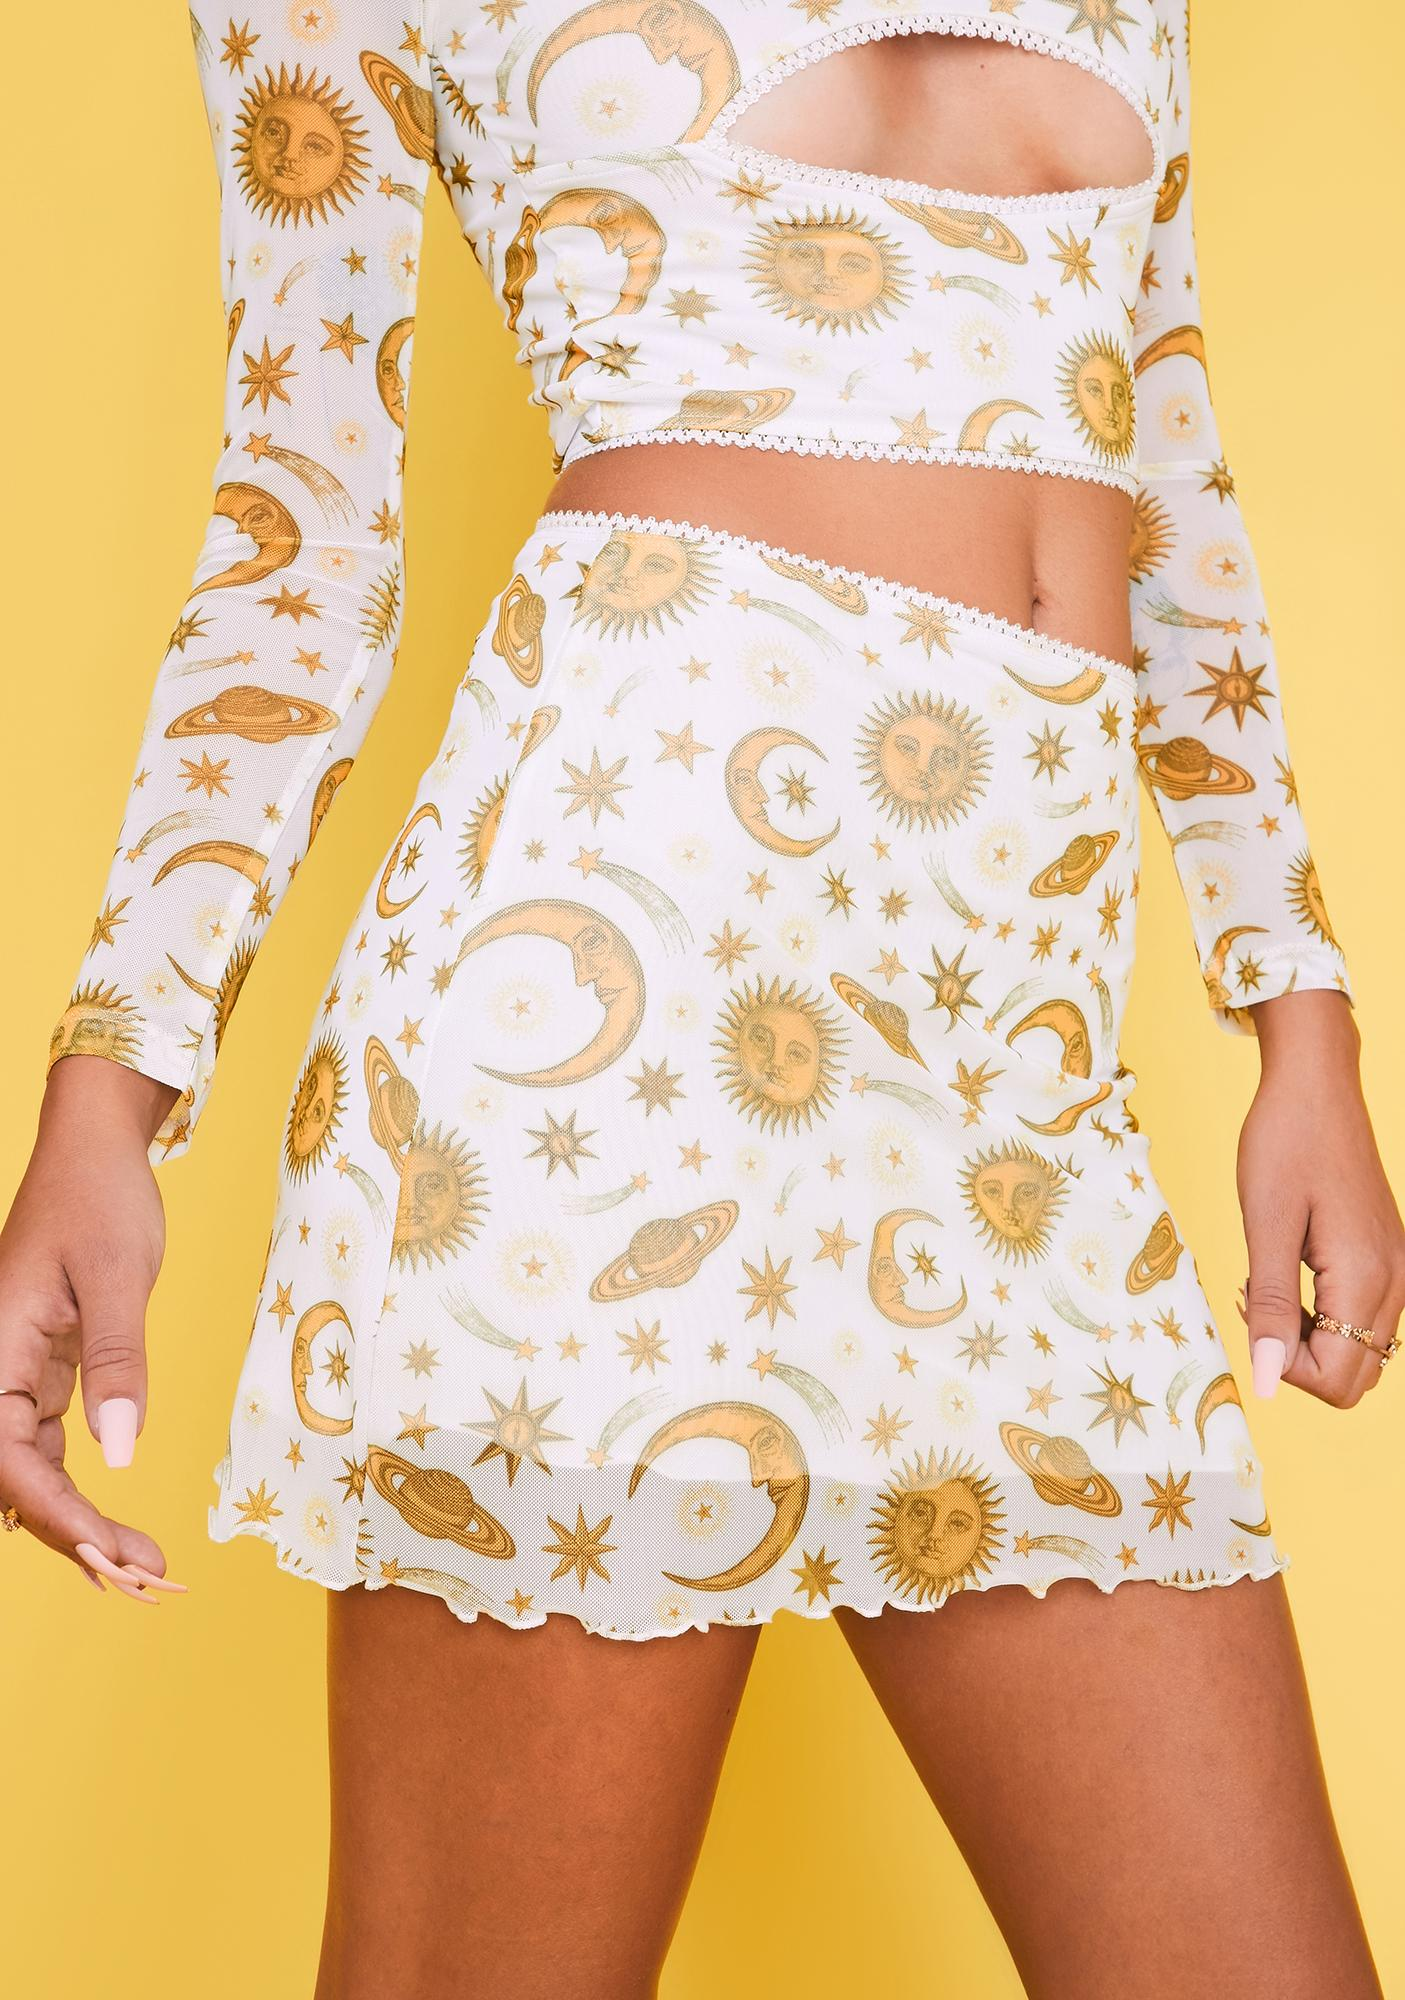 HOROSCOPEZ Show Me A Sign Mini Skirt